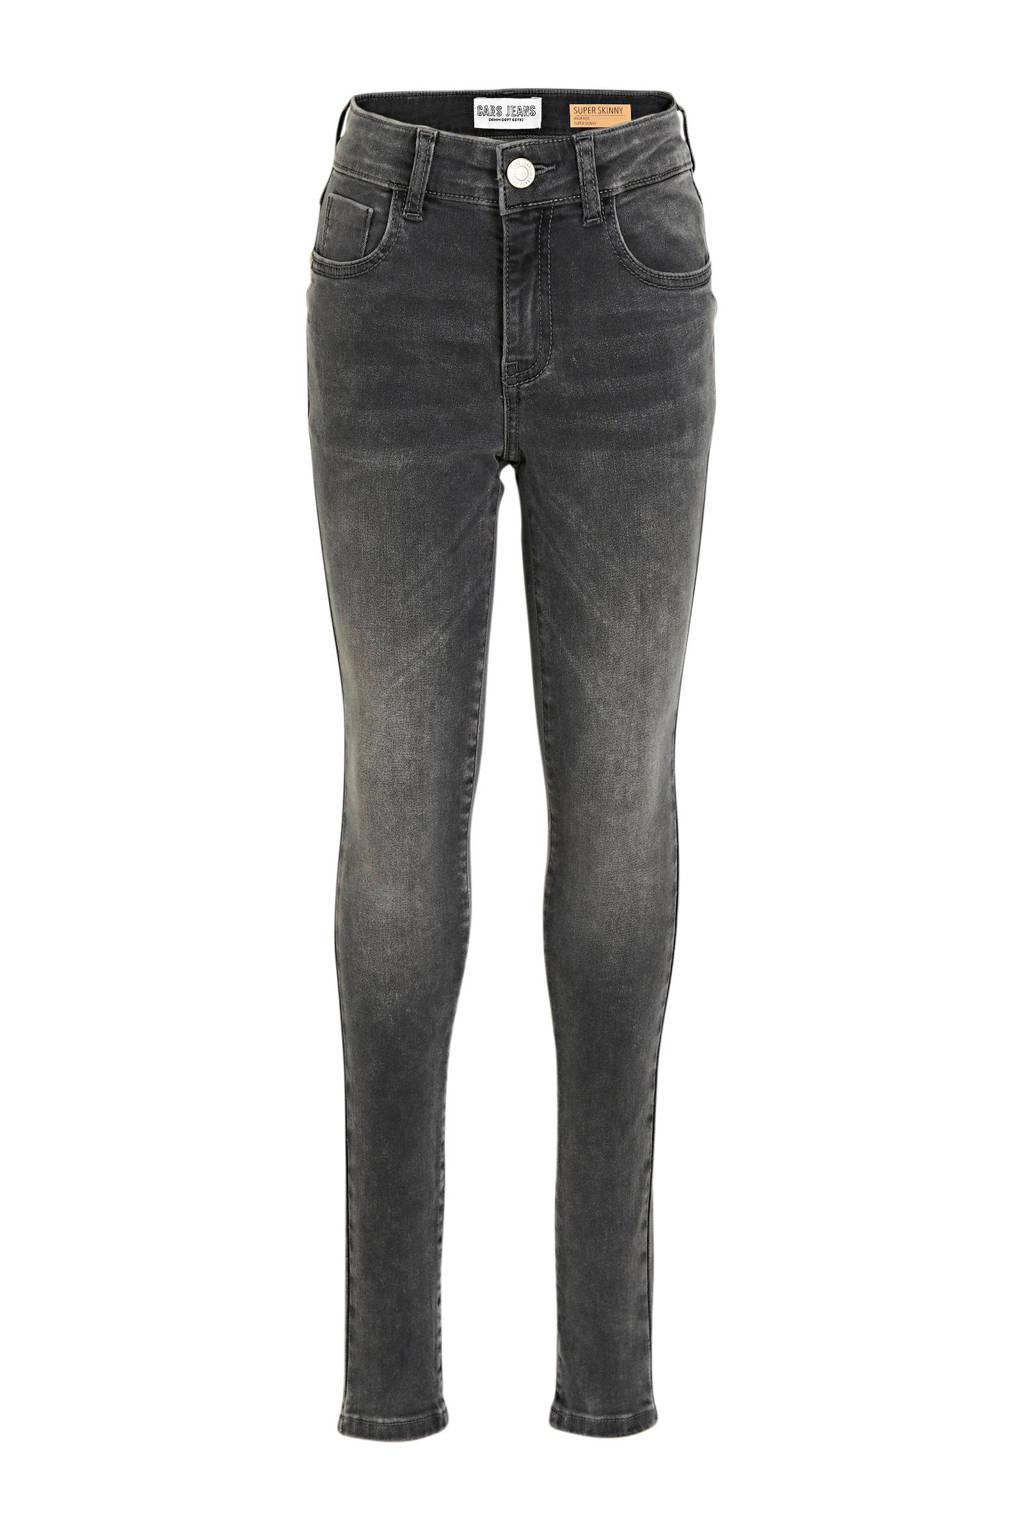 Cars high waist skinny jeans Ophelia mid grey, Mid Grey